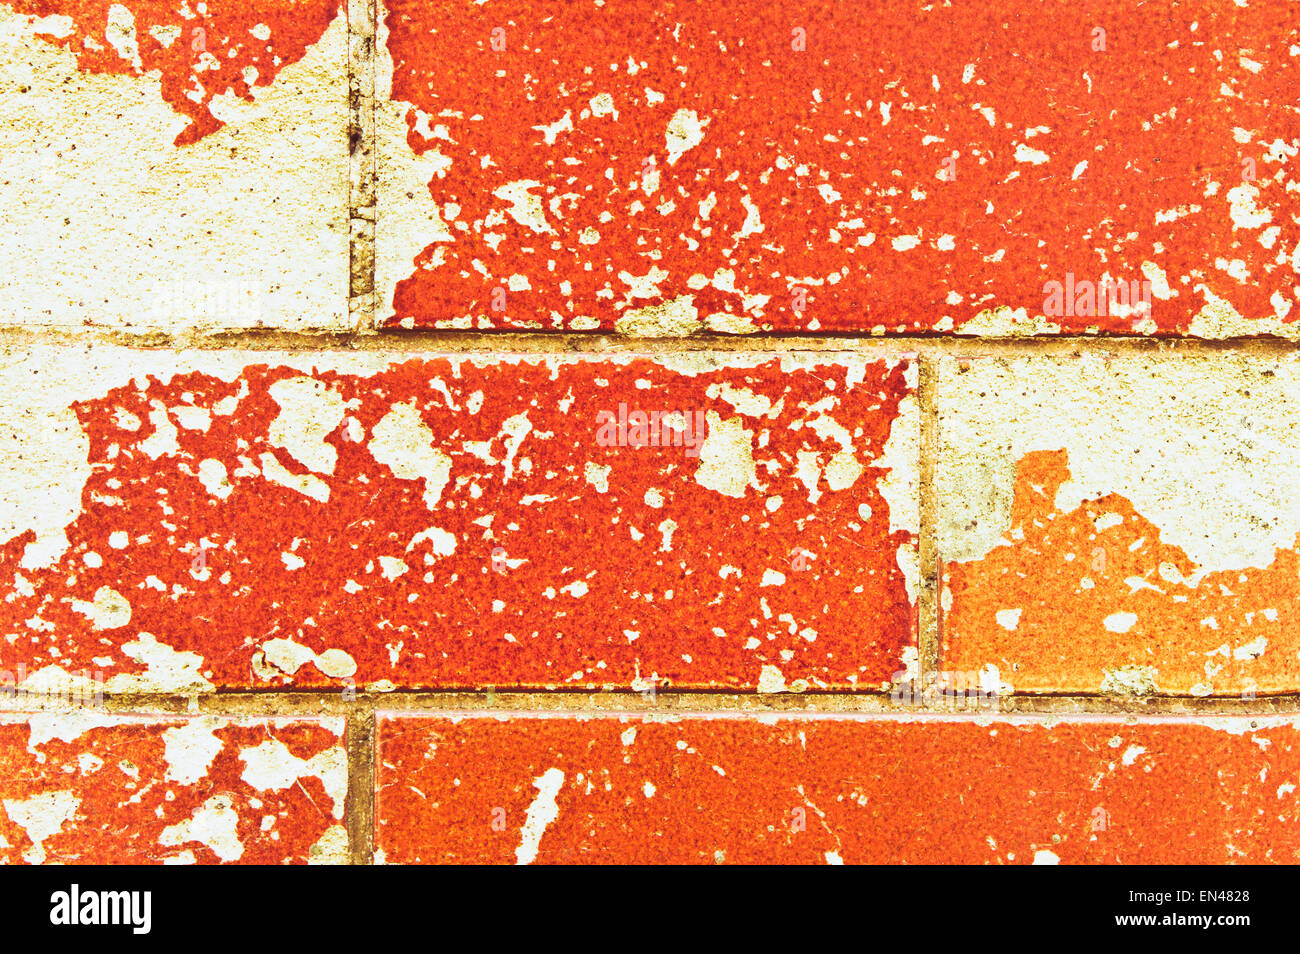 Glazed brown bricks damages exposing underlying stone Stock Photo